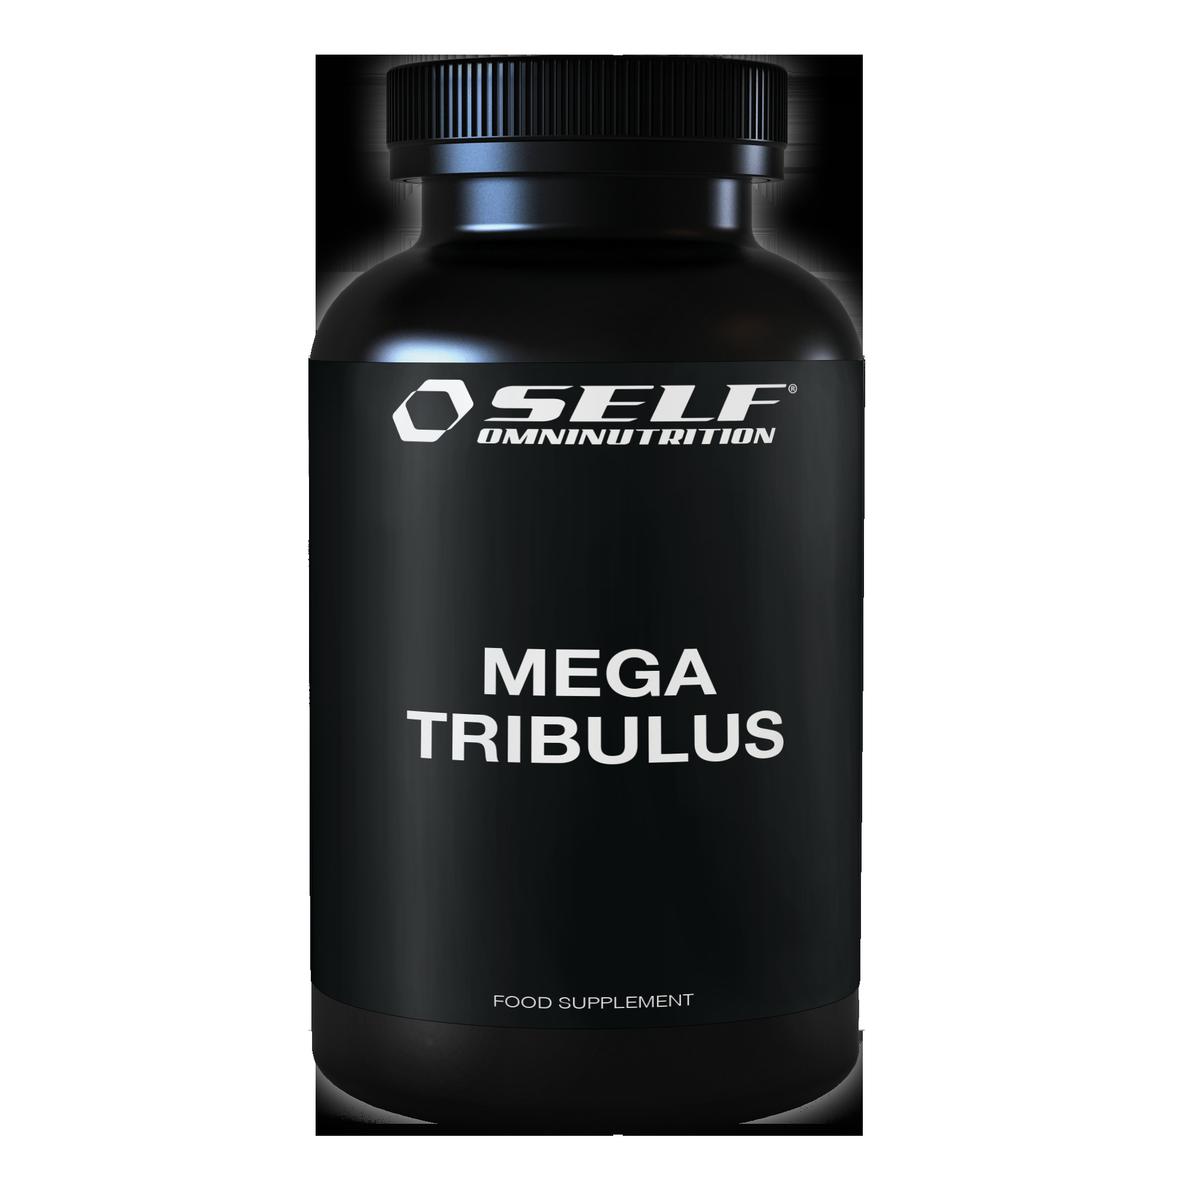 SELF_Mega_Tribulus_mockup_preview